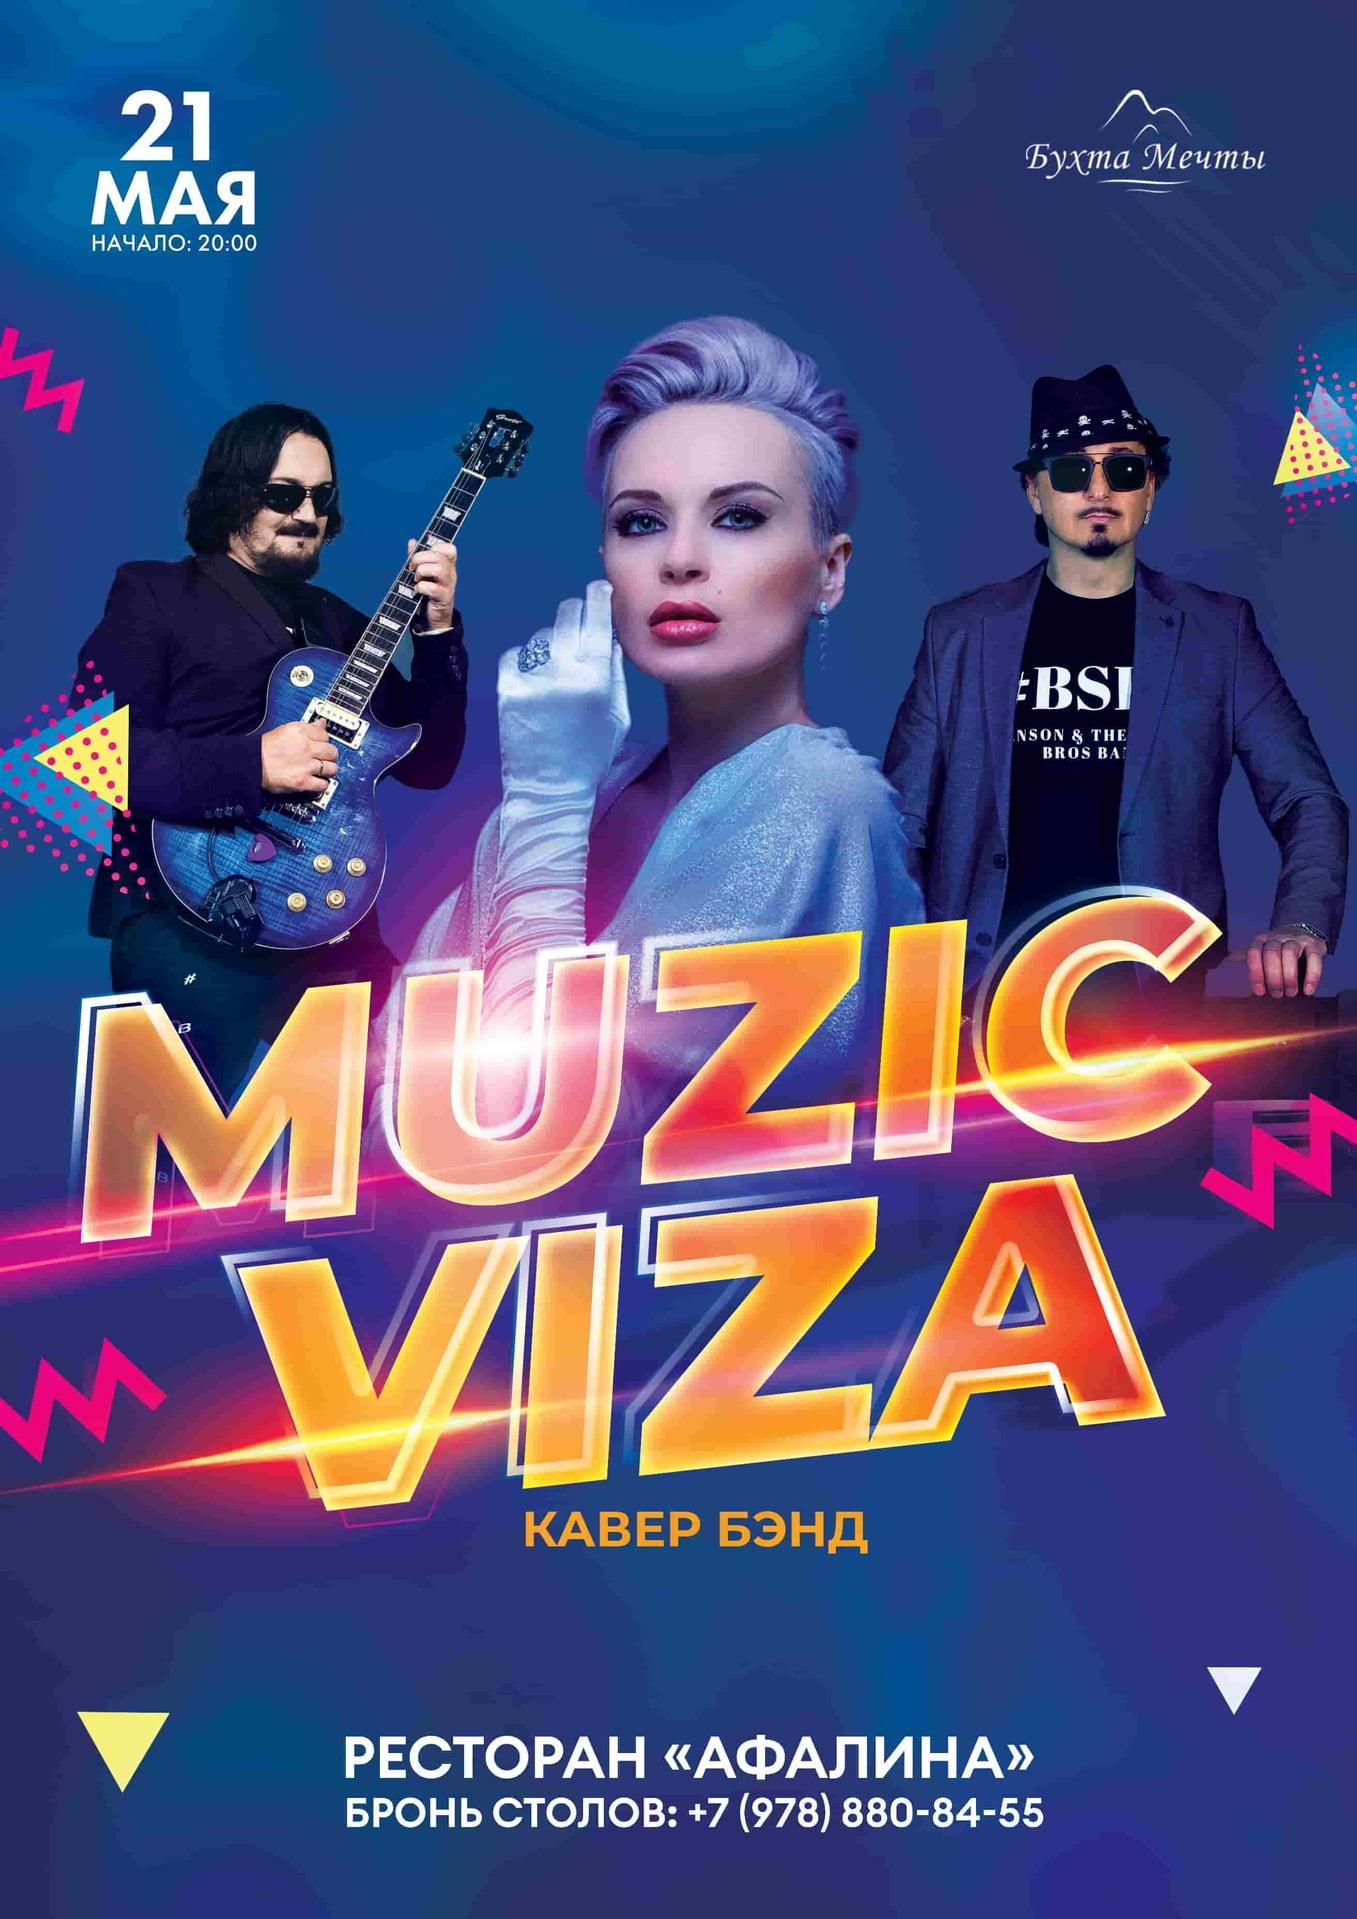 Концерт Muzic Viza в Бухте Мечты